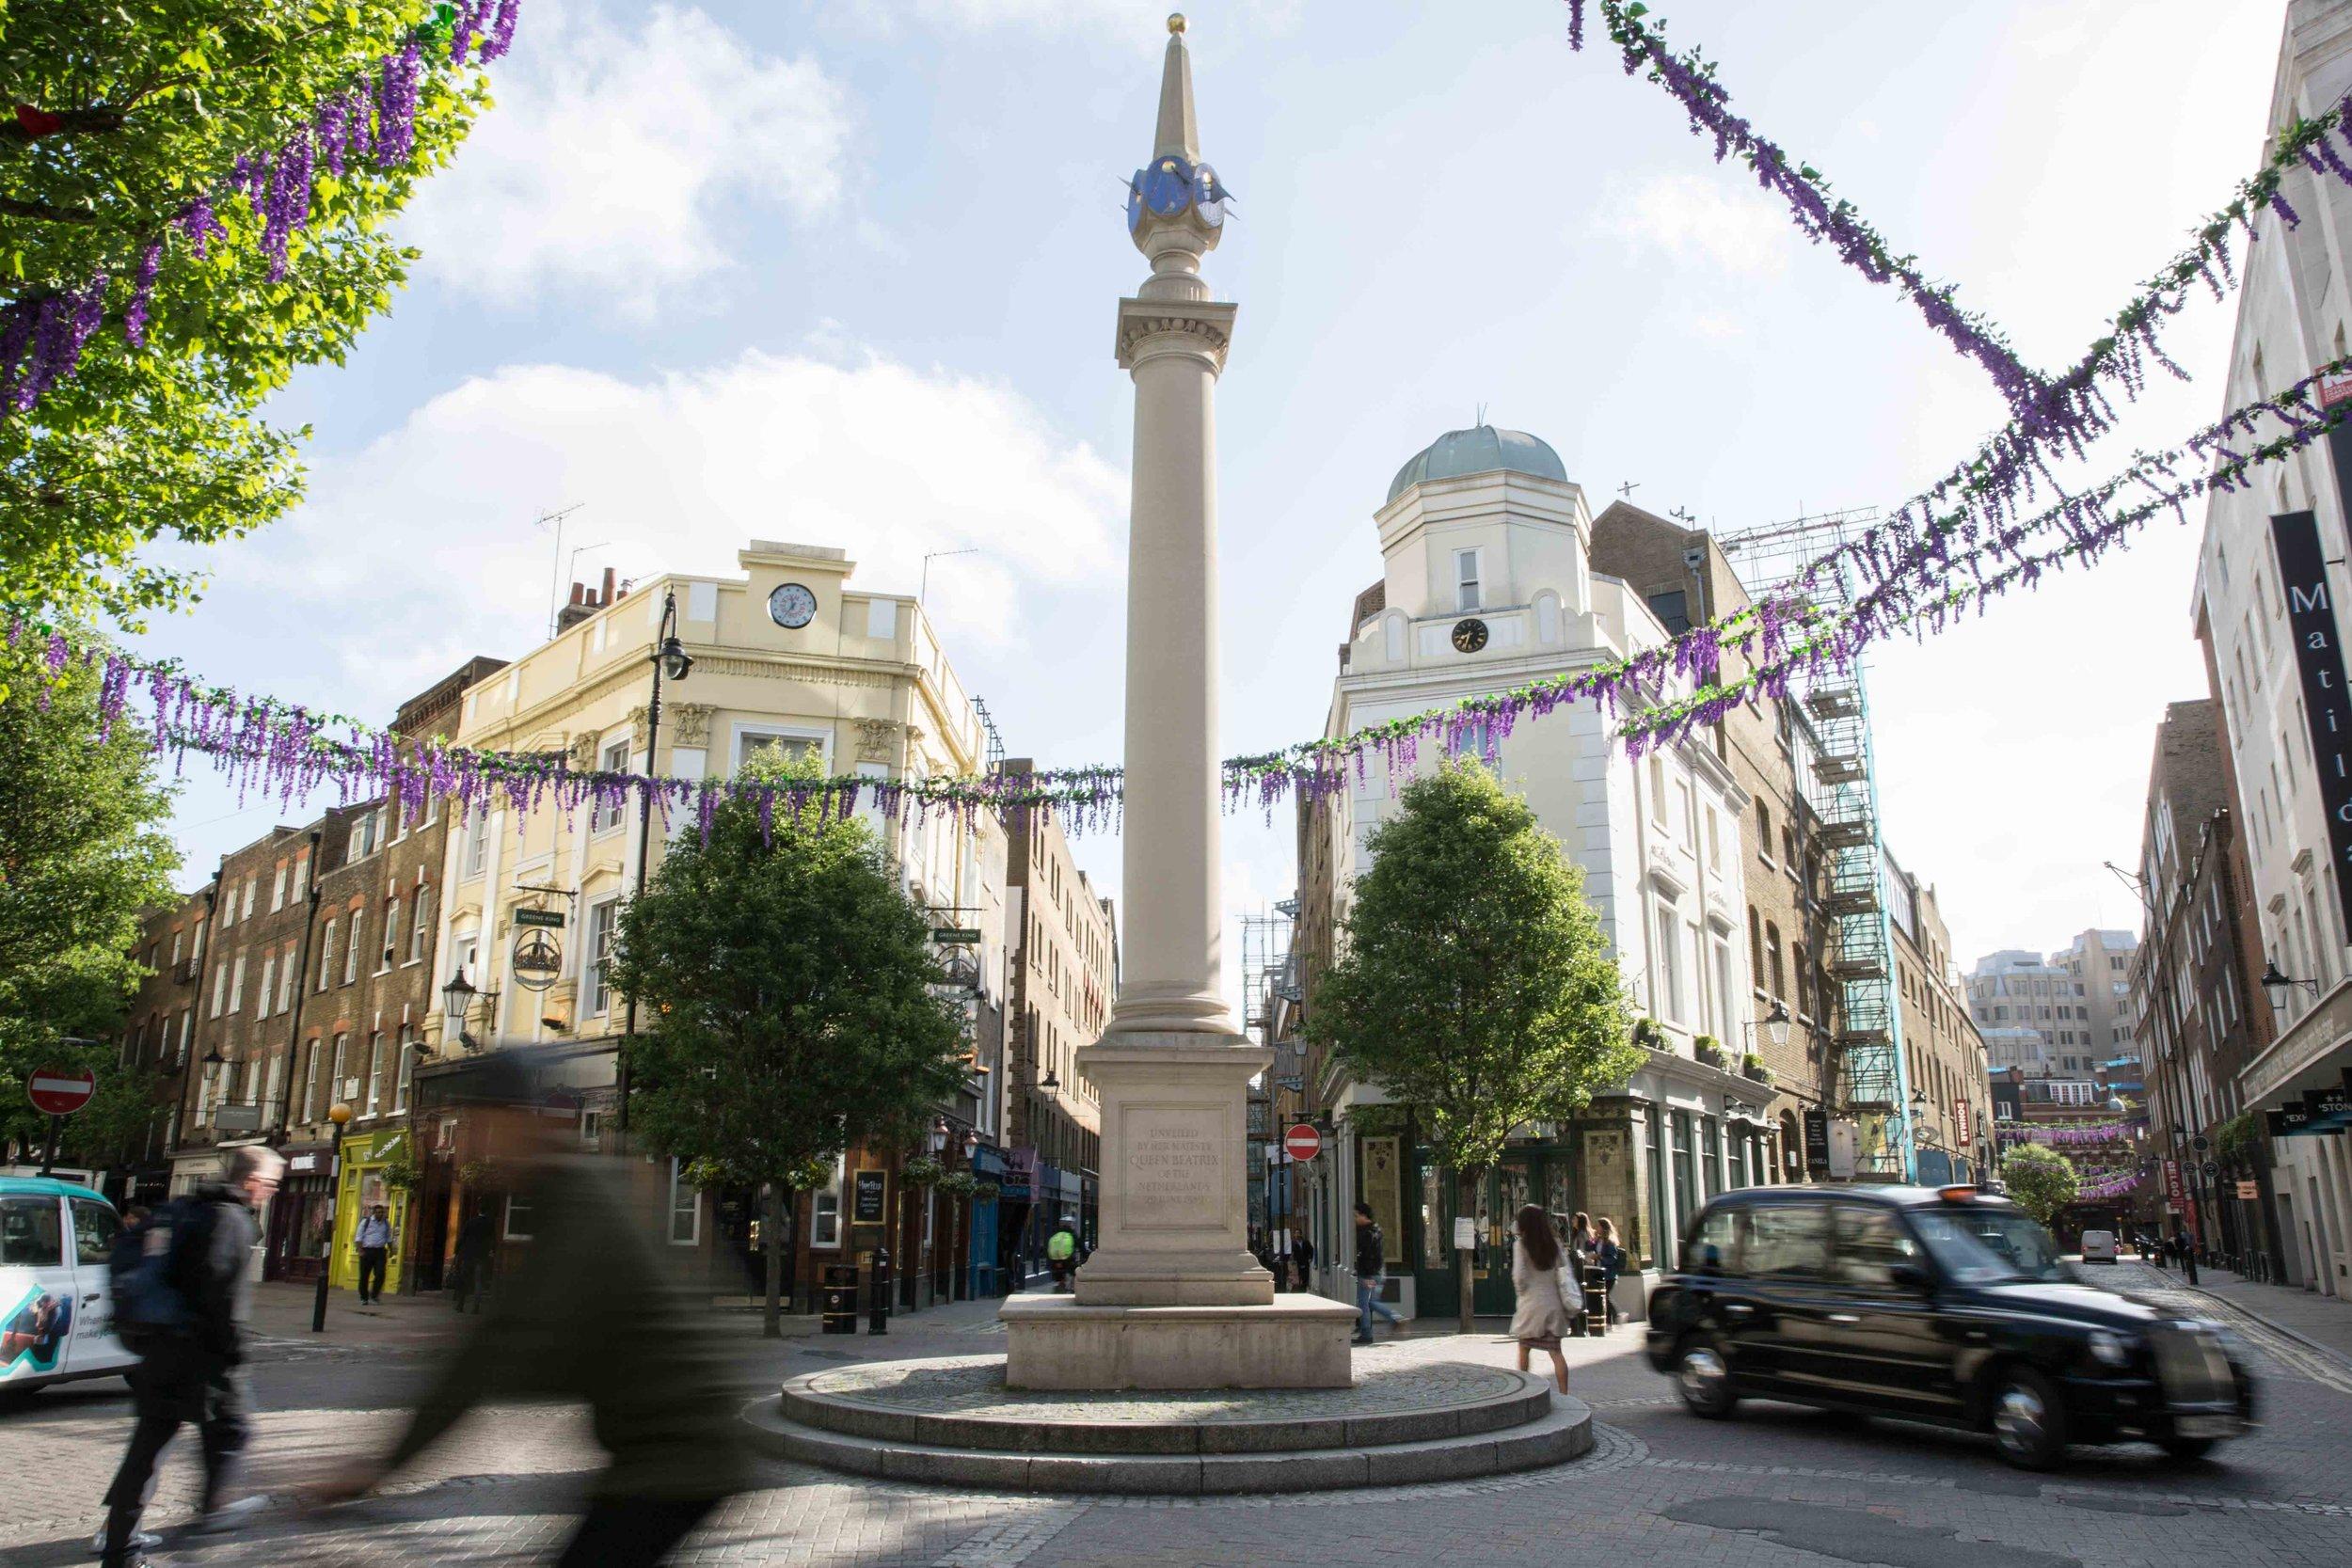 JCTP0104-Covent Garden-London-UK-mcconaghy-10.jpg